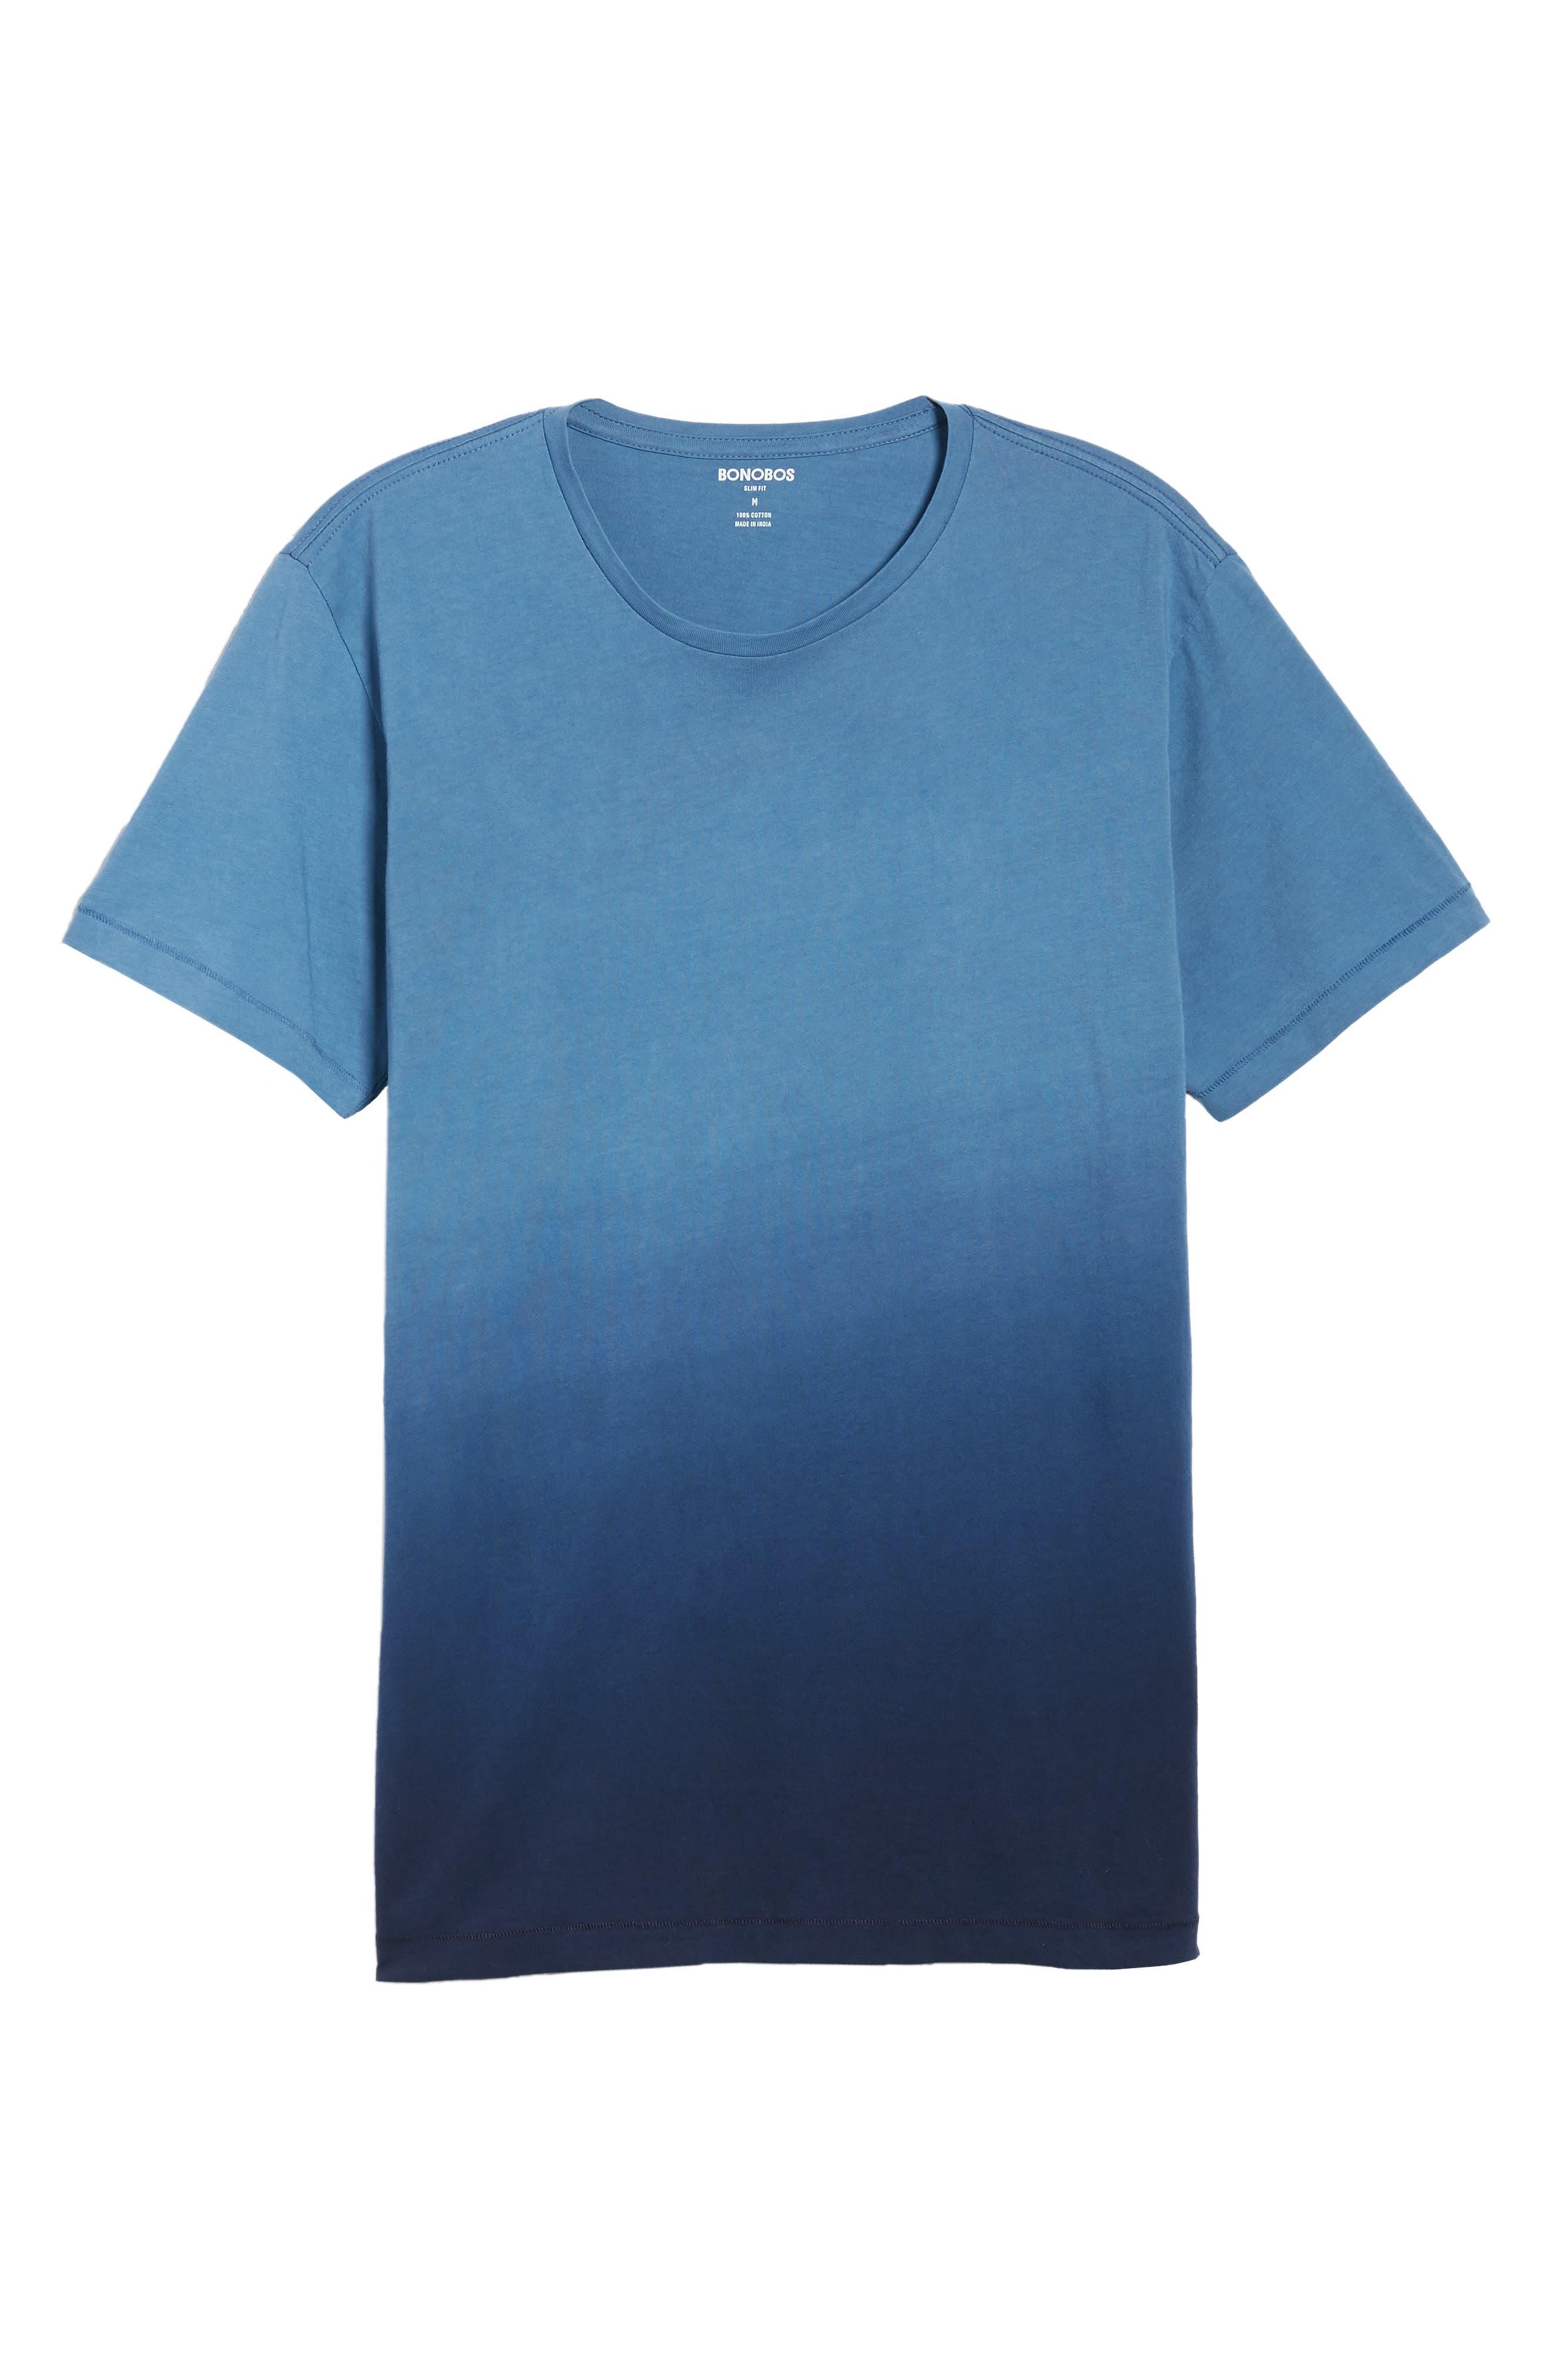 Dip Dye T-Shirt,                             Alternate thumbnail 6, color,                             Navy Ombre